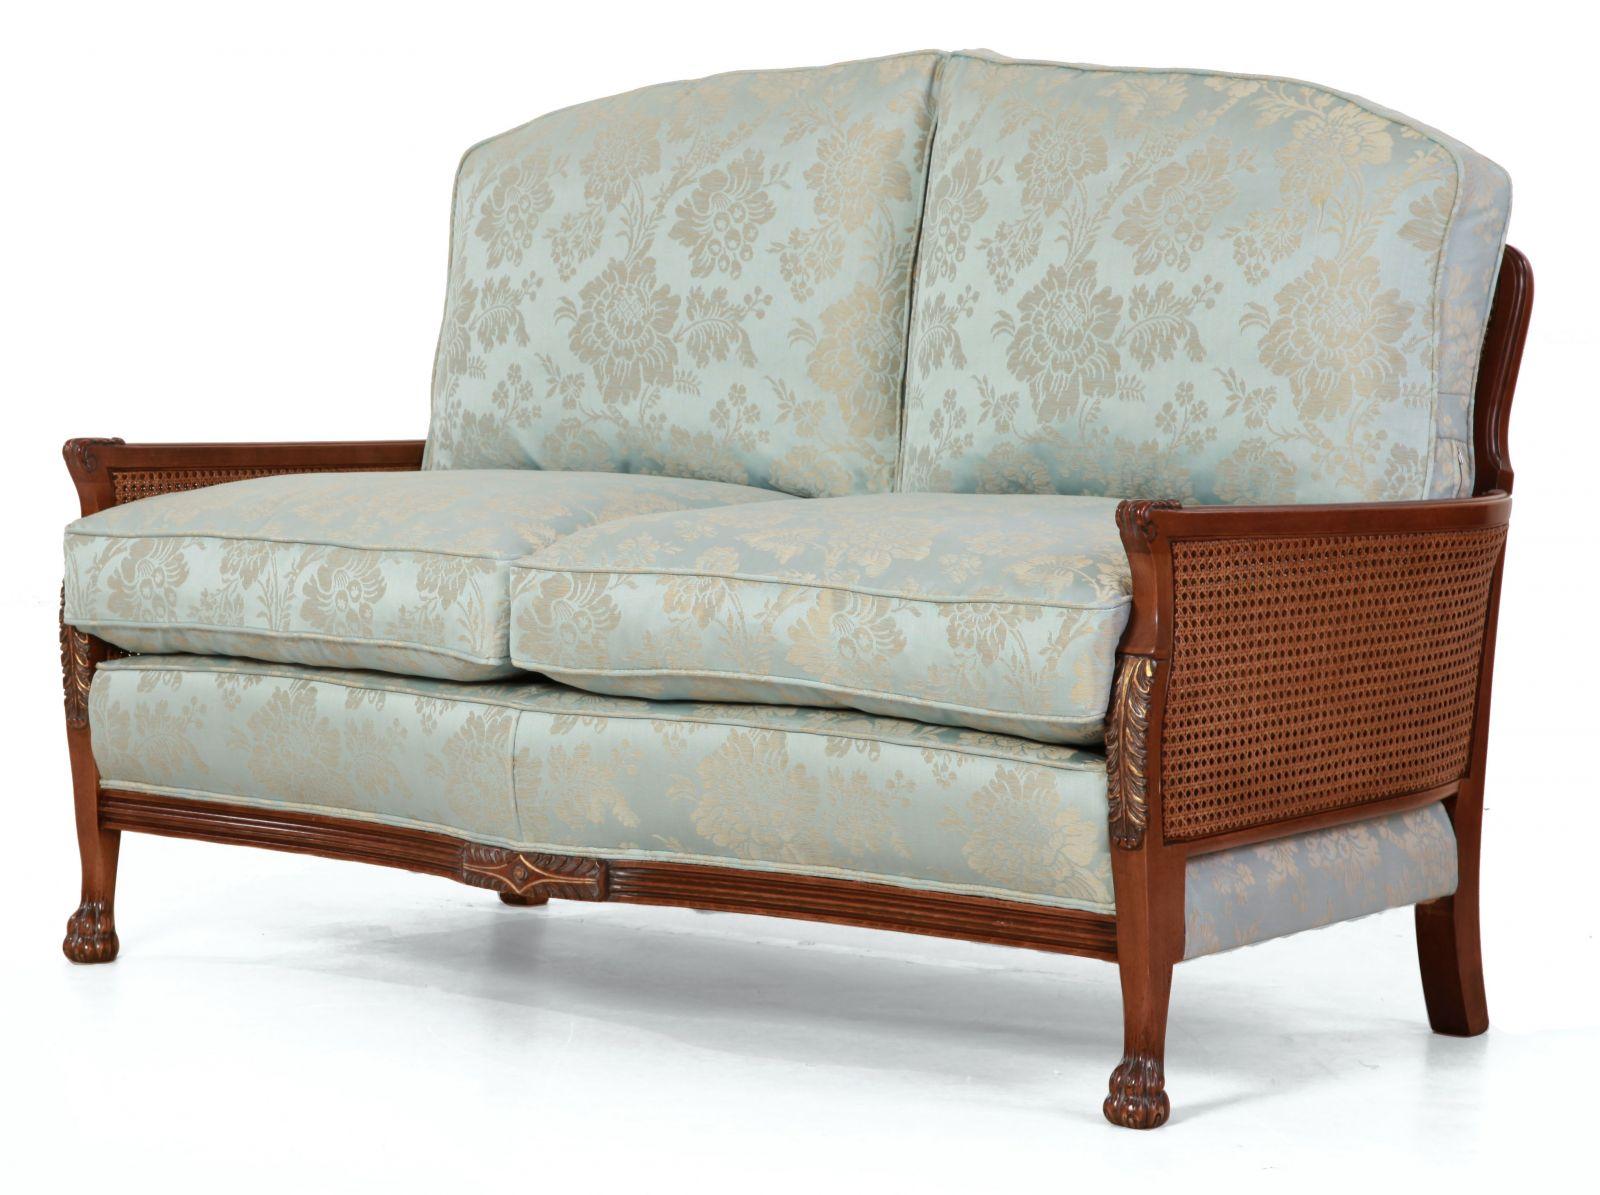 Italian frame Bergere - 2 seat sofa + Chair